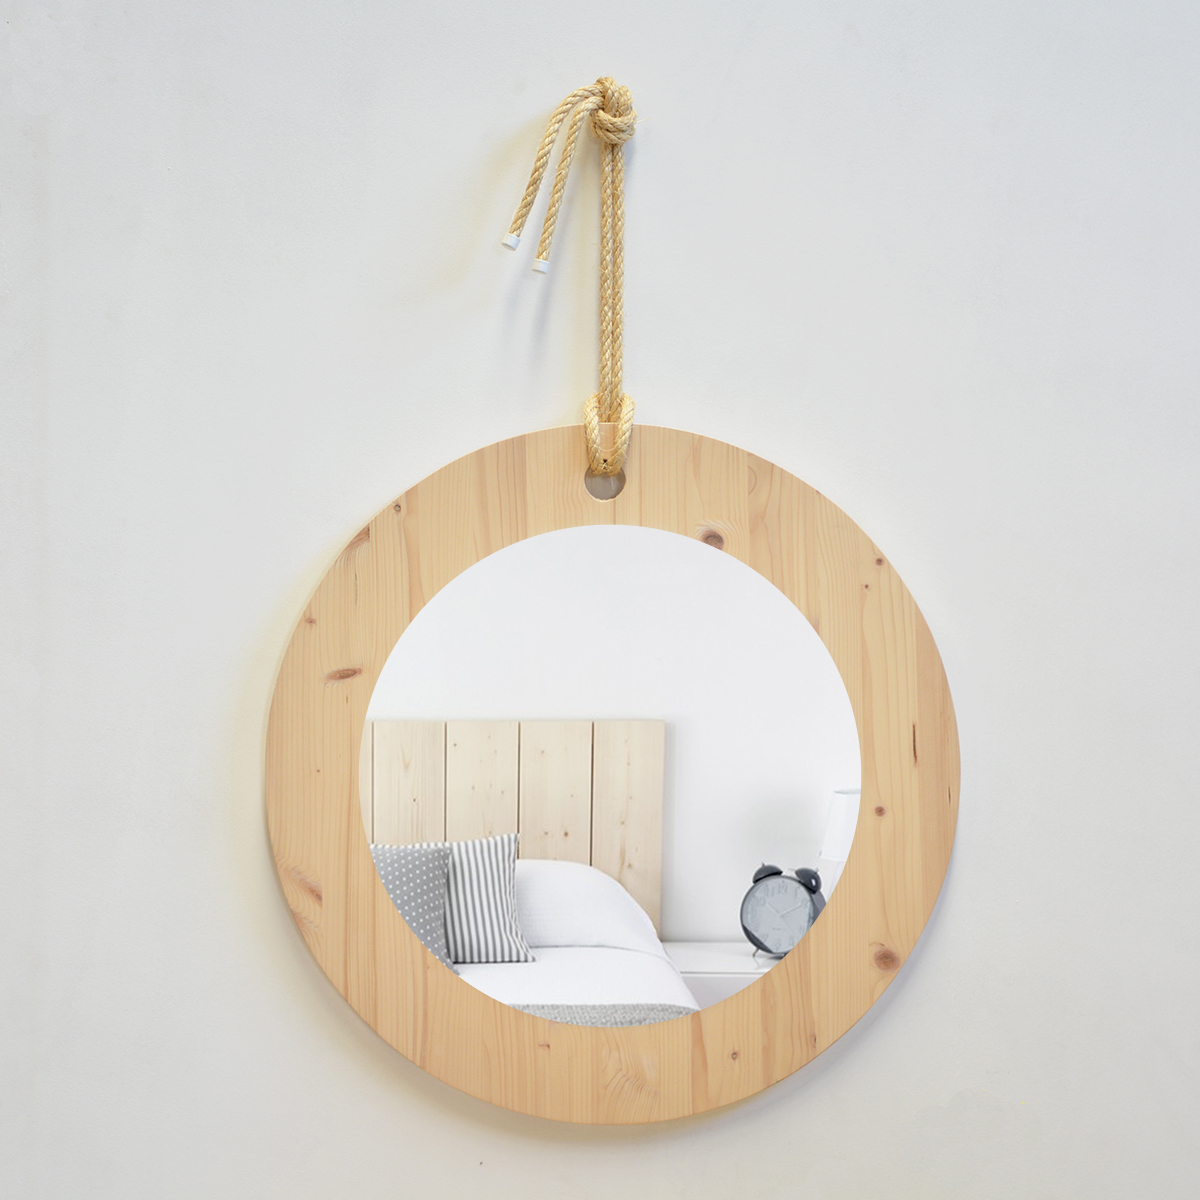 Espejo de estilo n rdico original tienda online mueble - Espejo nordico ...